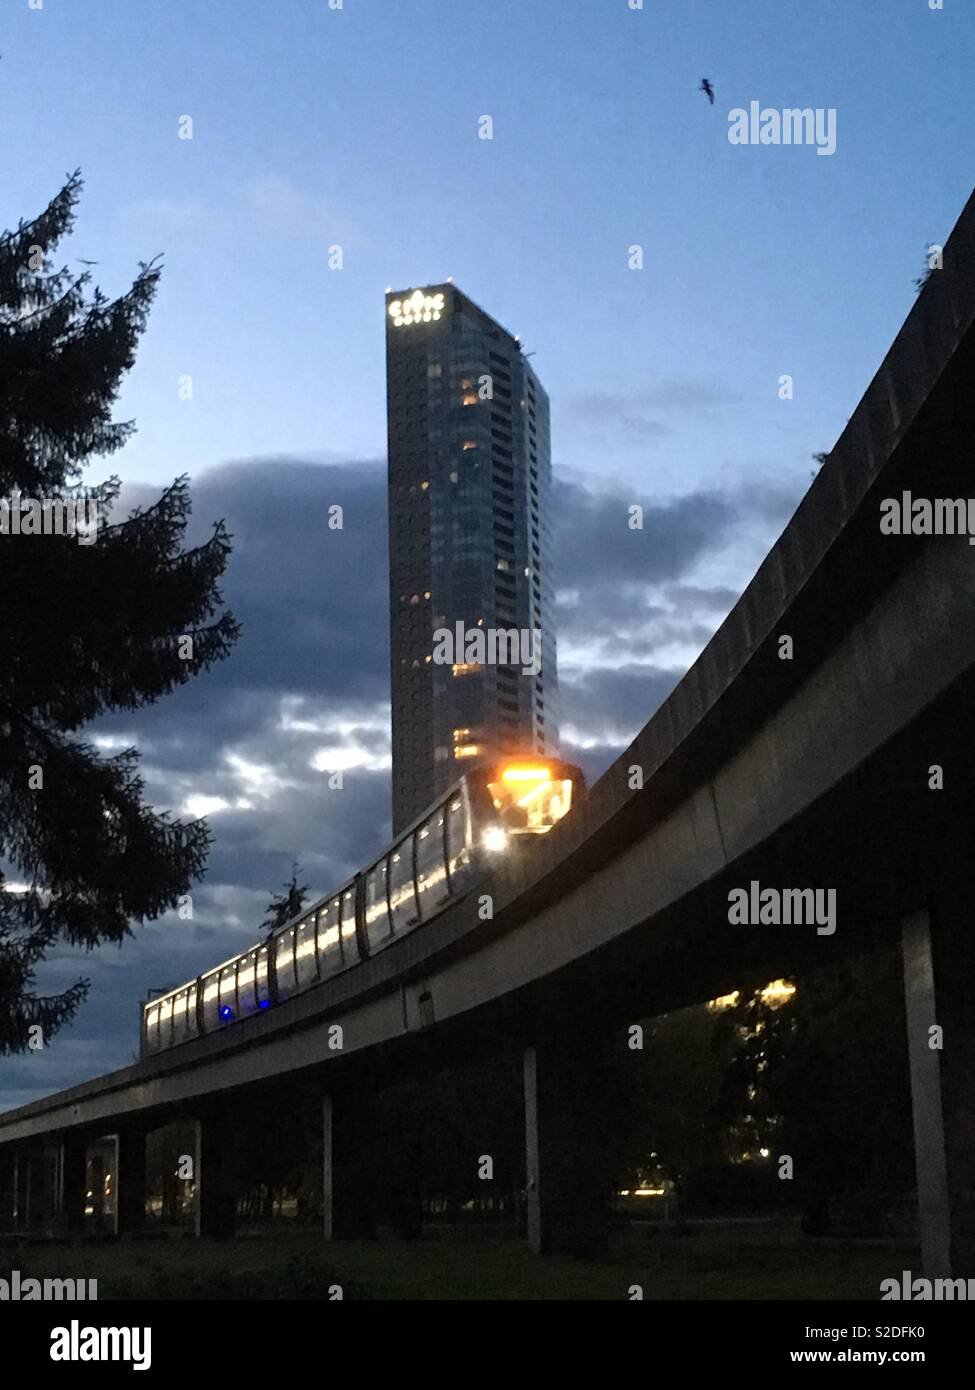 Morning commute - Stock Image